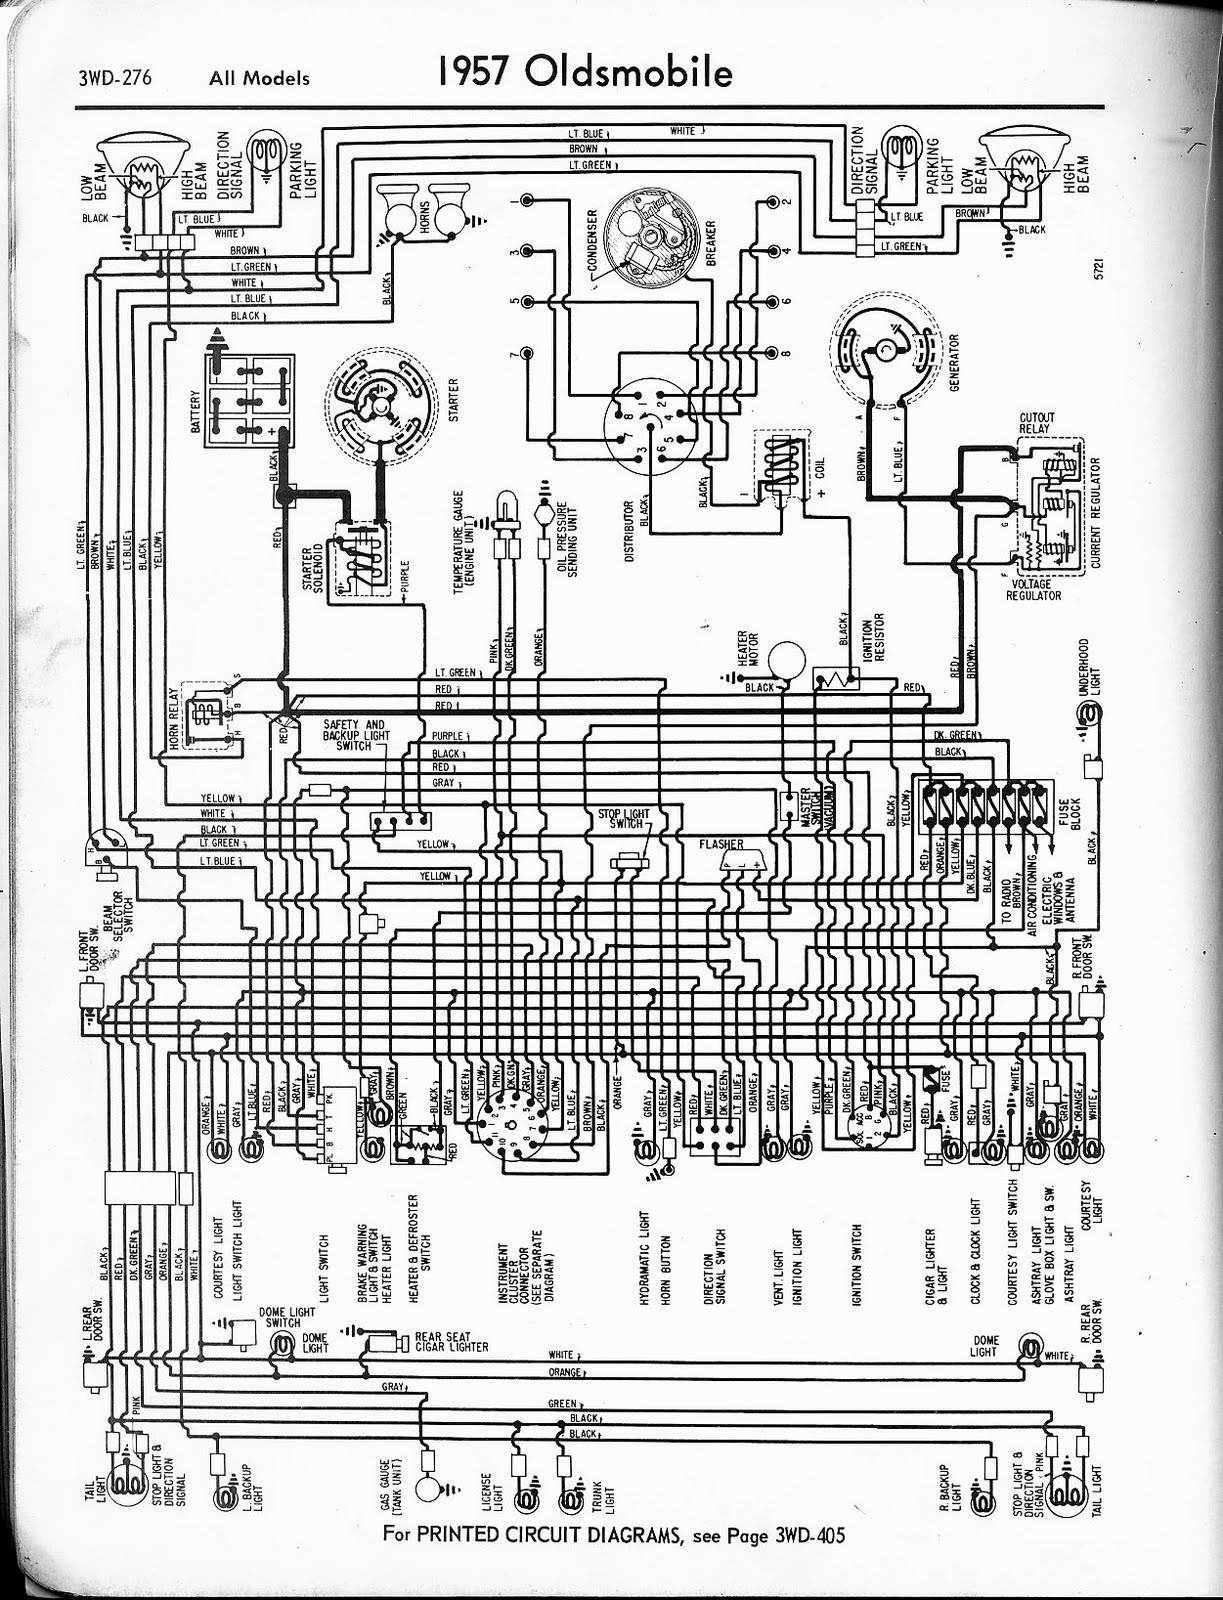 free auto wiring diagram 1957 oldsmobile wiring diagram [ 1223 x 1600 Pixel ]